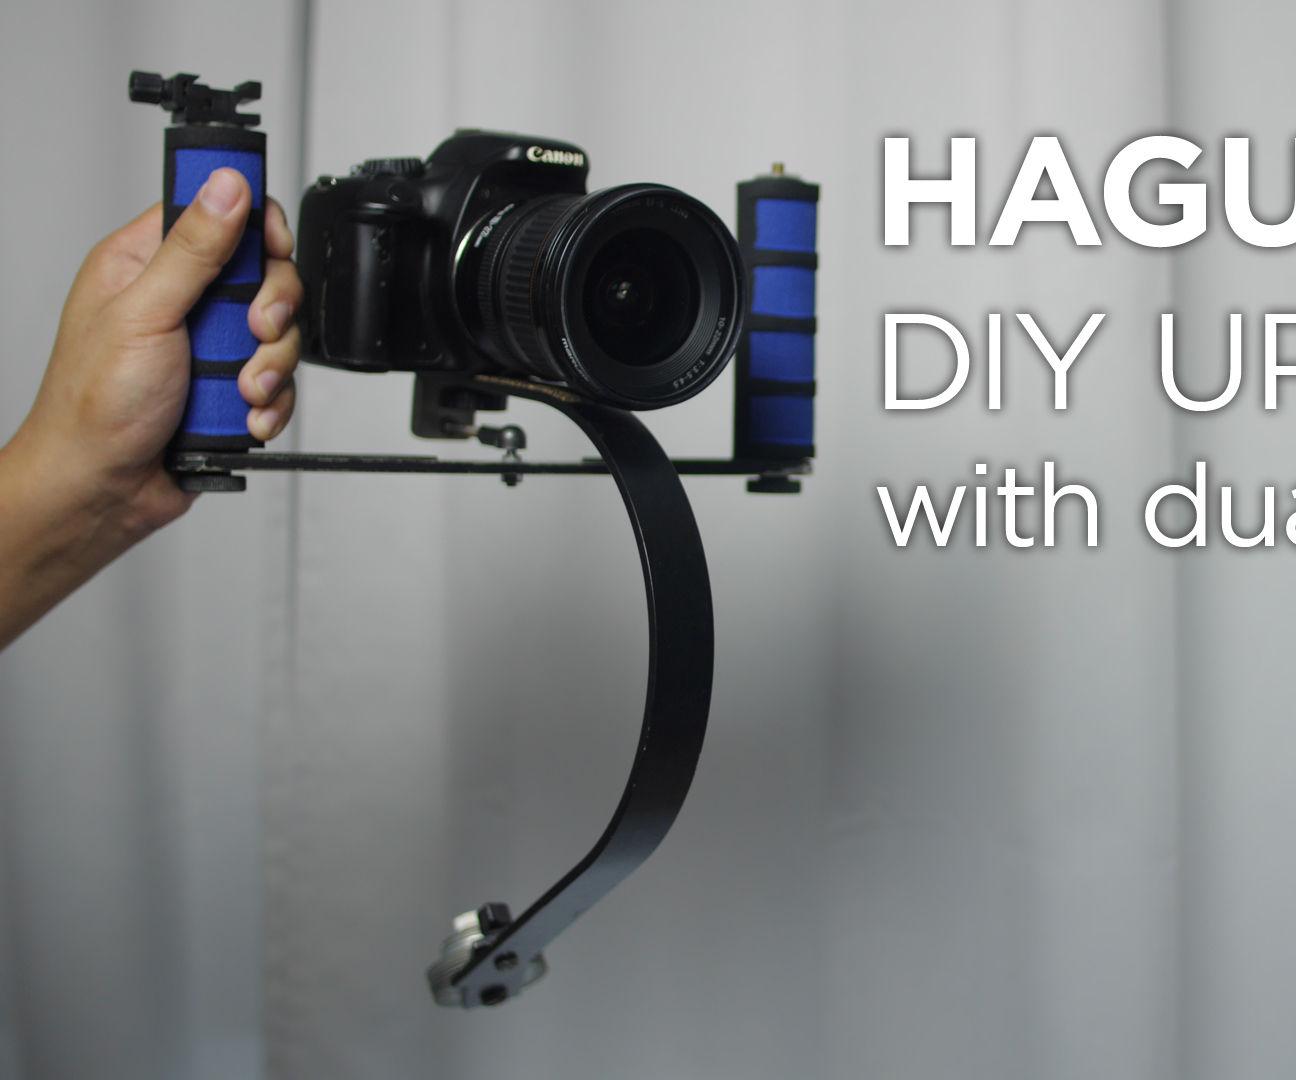 Hague MMC DIY upgrade